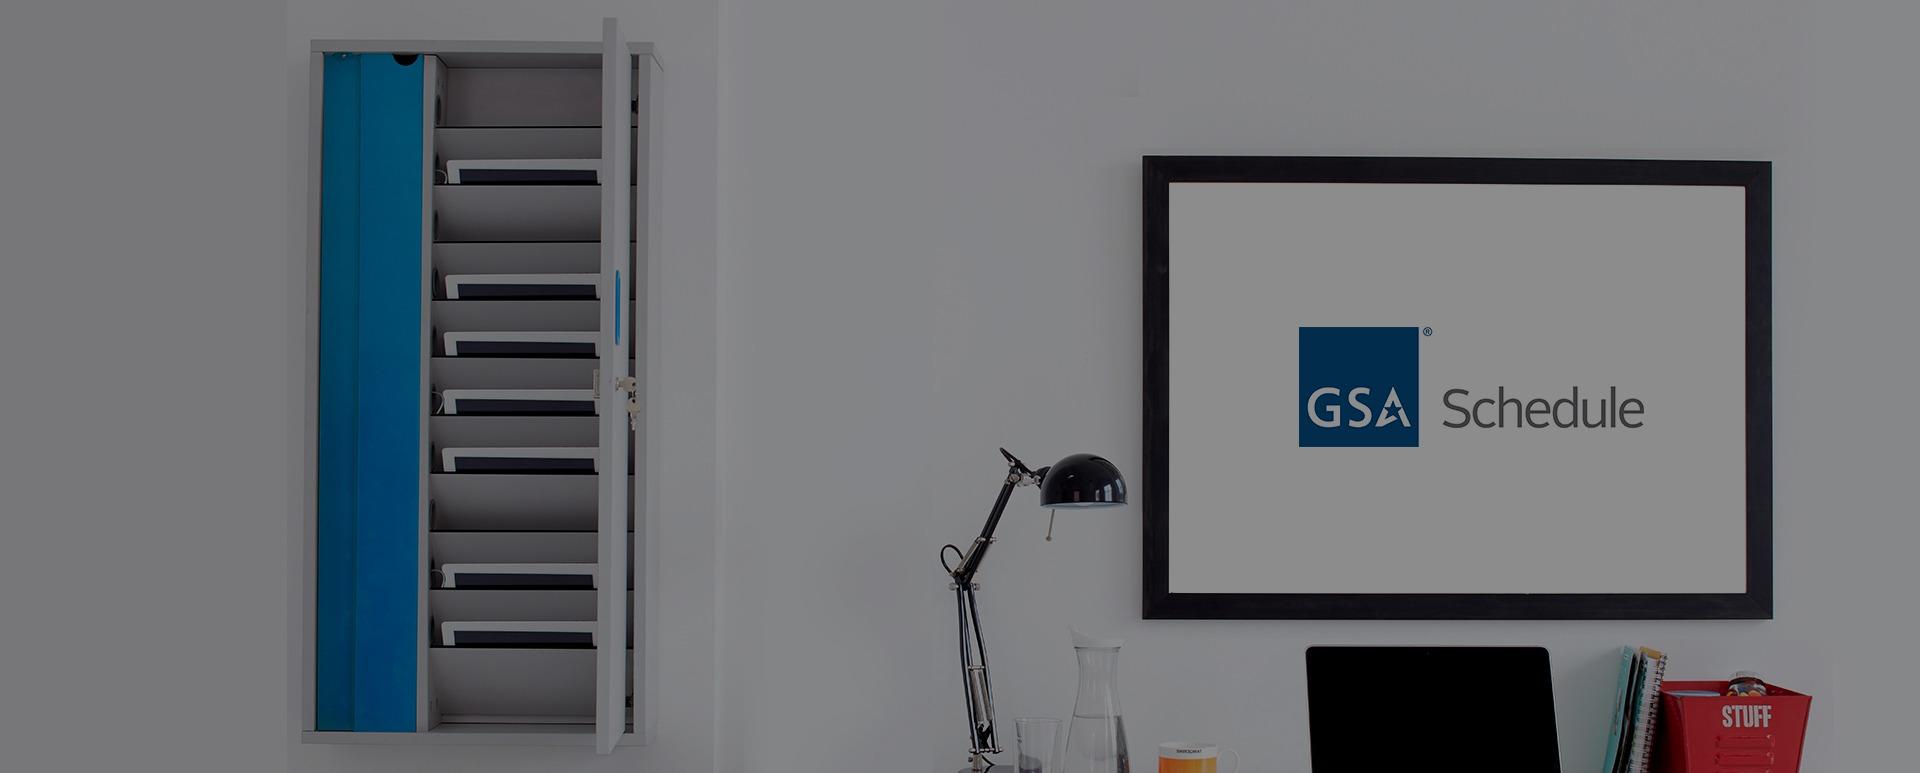 LapCabby GSA Schedule Contract